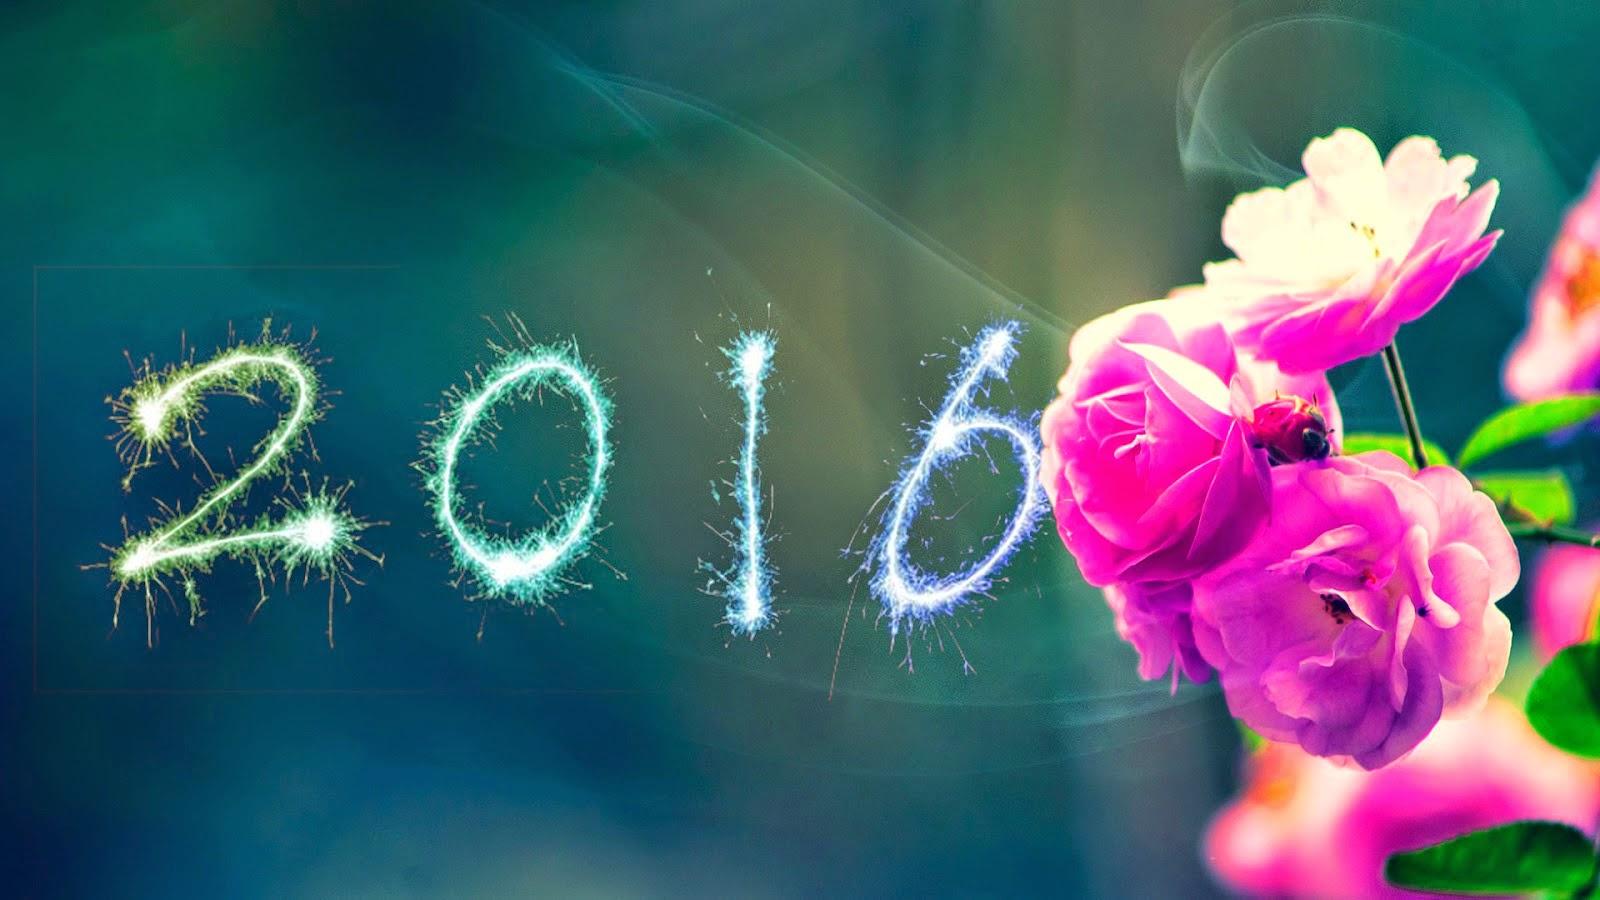 Yeni Y L Mesajlar 2016 En G Zel Y Lba S Zleri